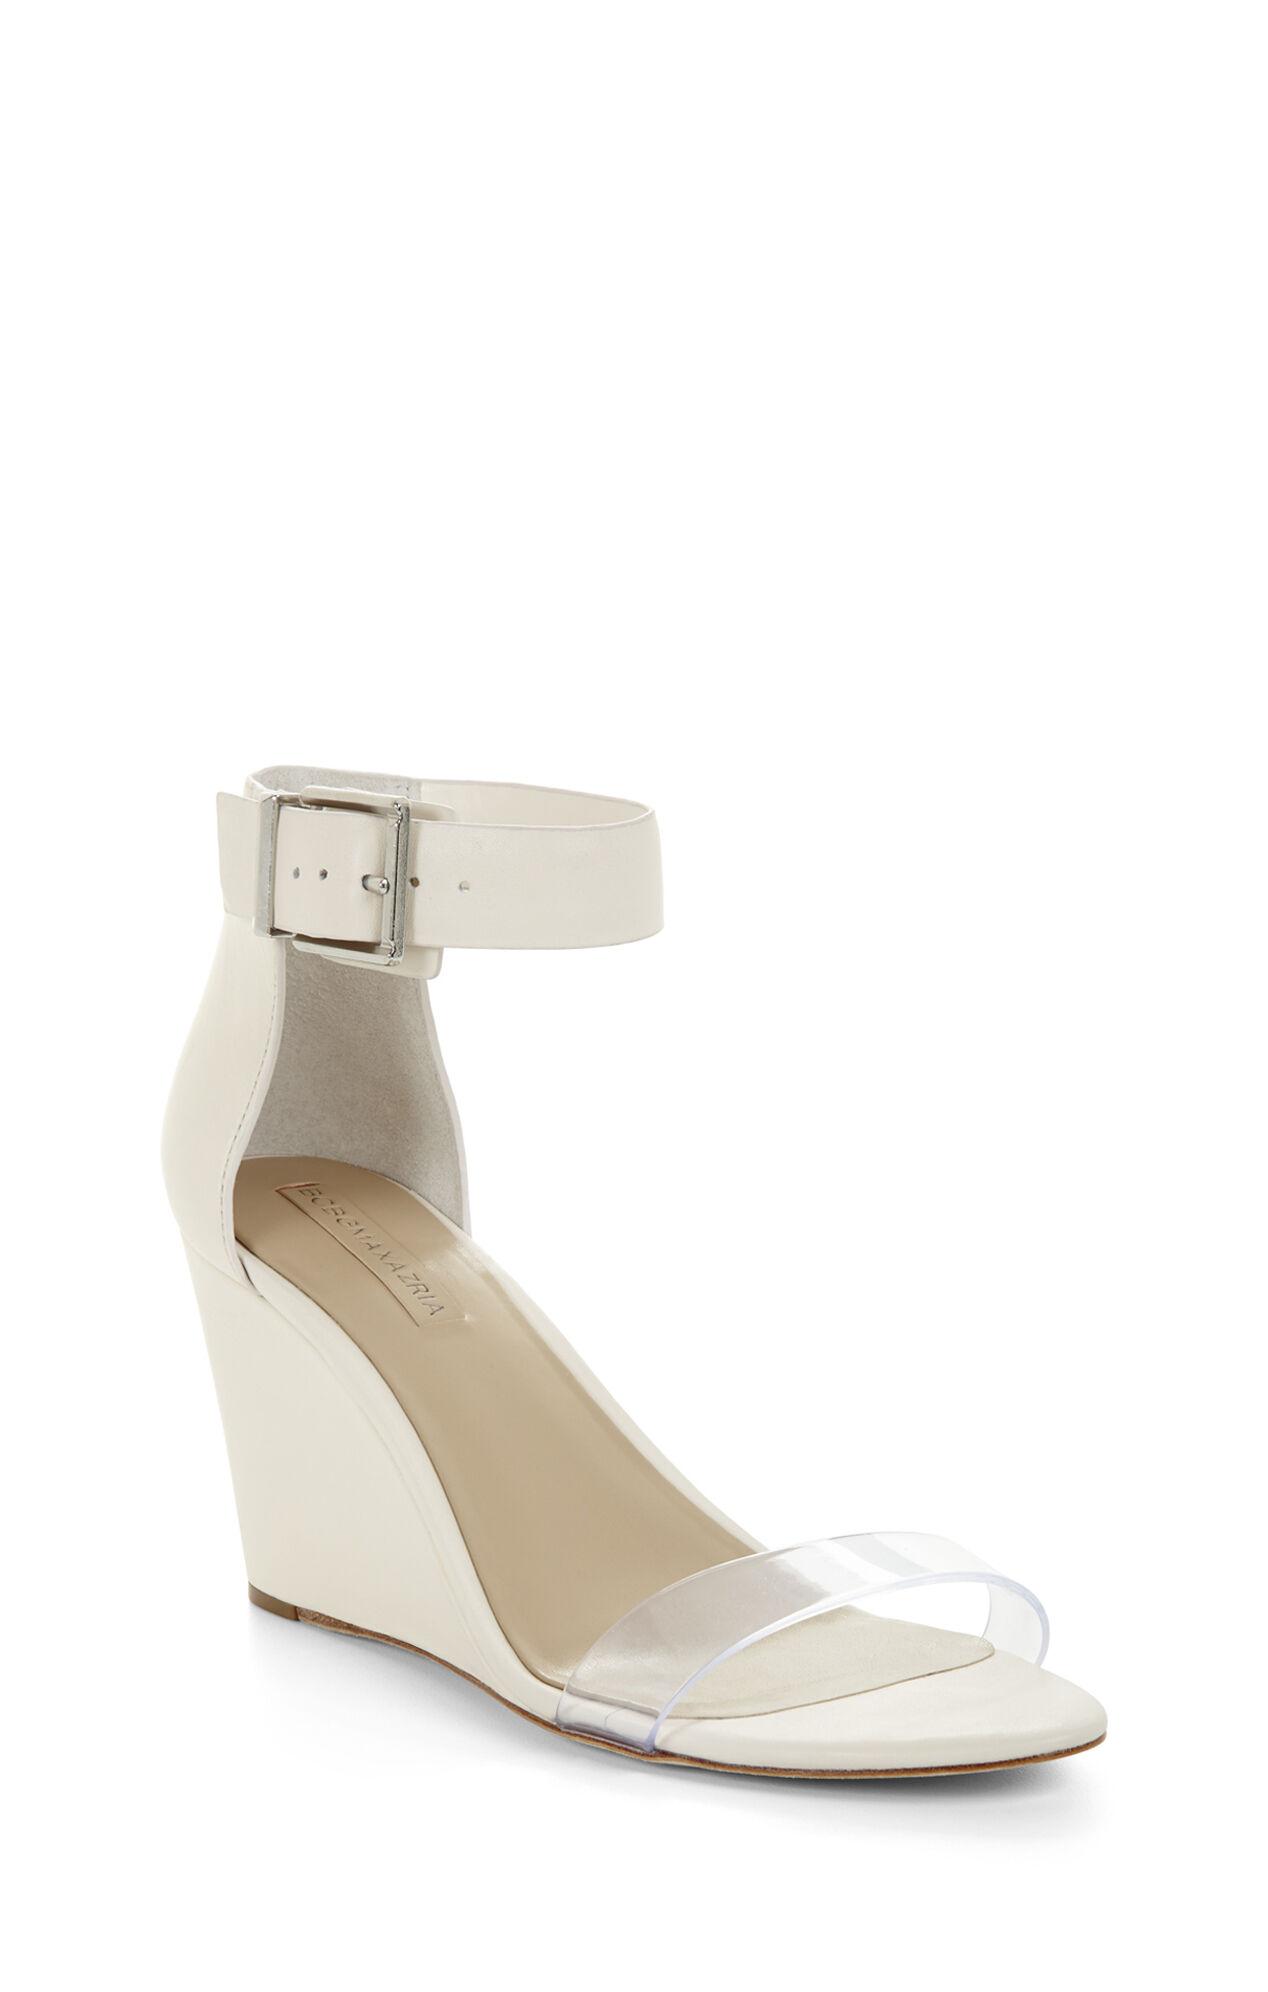 Latch Wedge Sandal